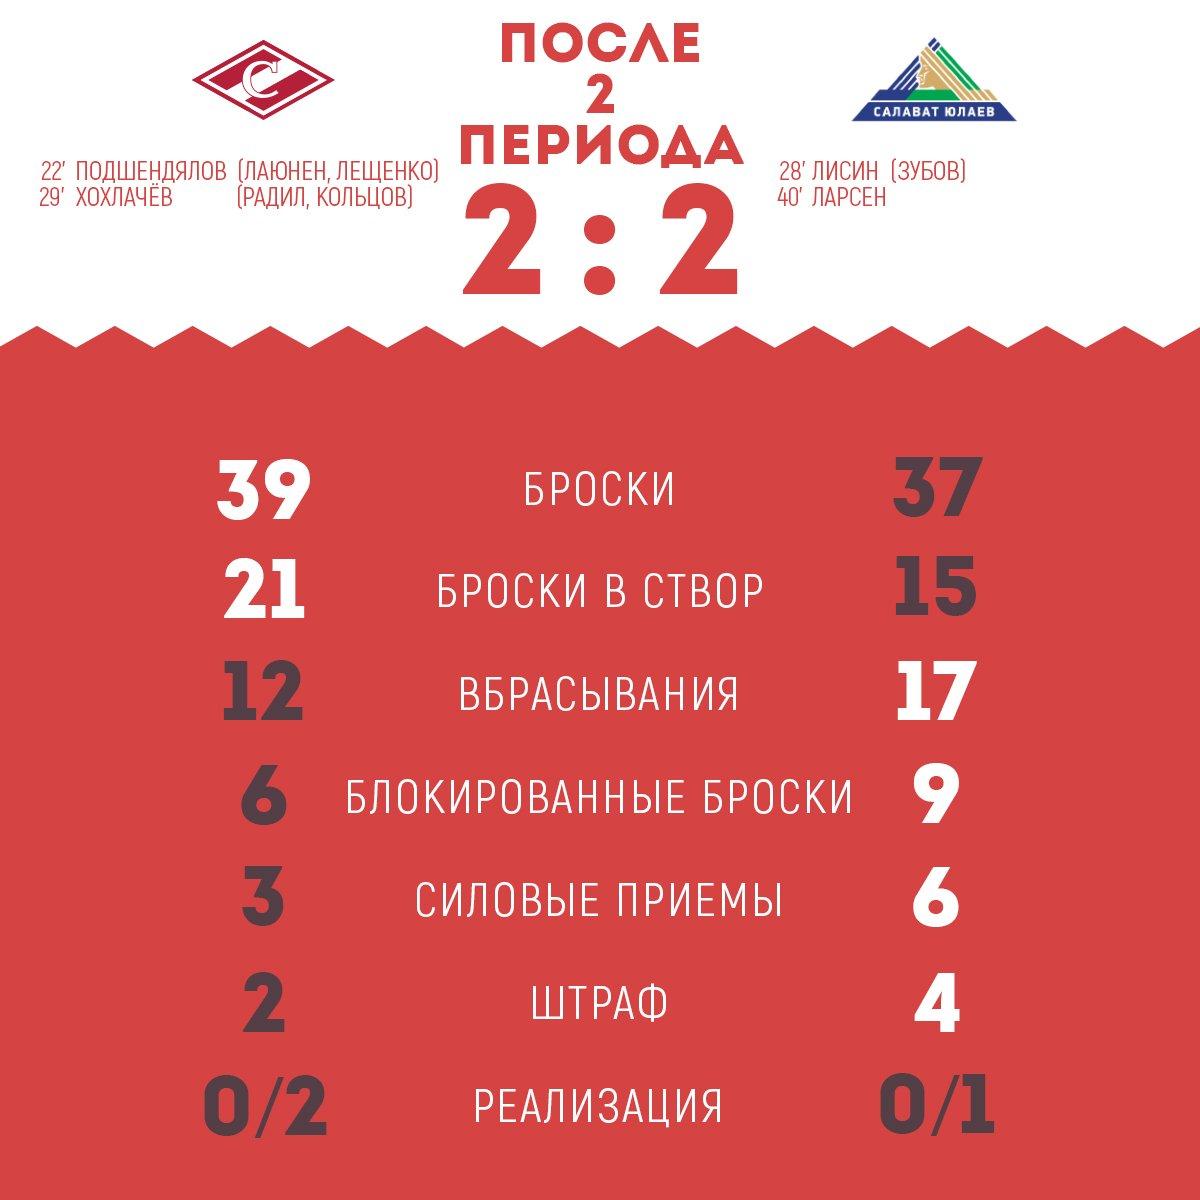 Статистика матча «Спартак» vs «Салават Юлаев» после 2-х периодов